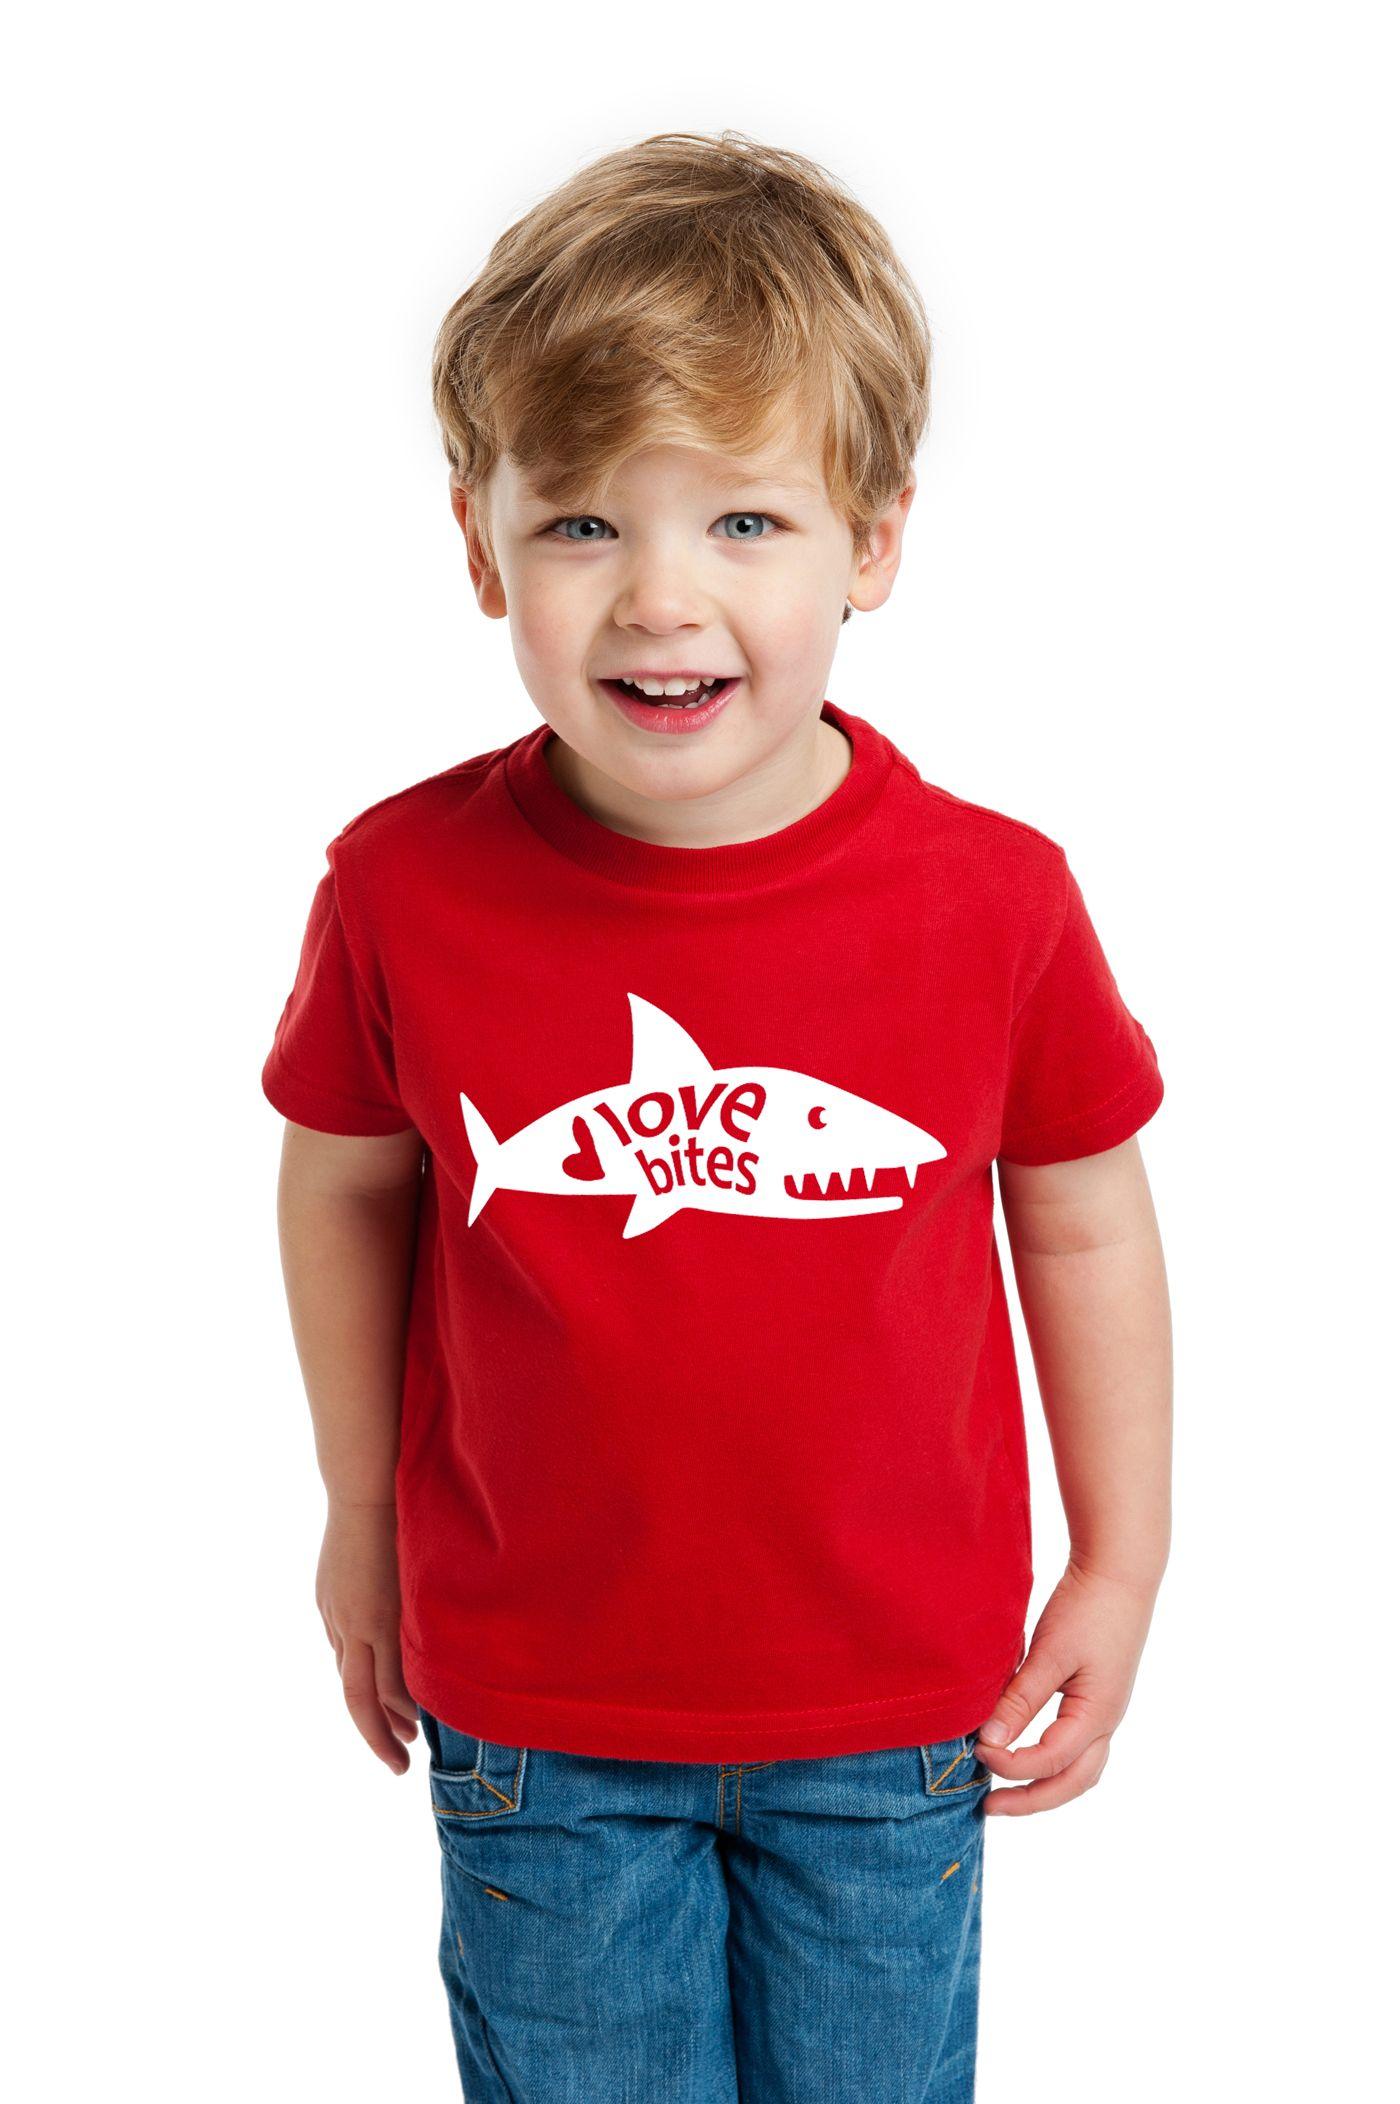 Valentines Day Shirts For Boys So Cute Wedding Decor